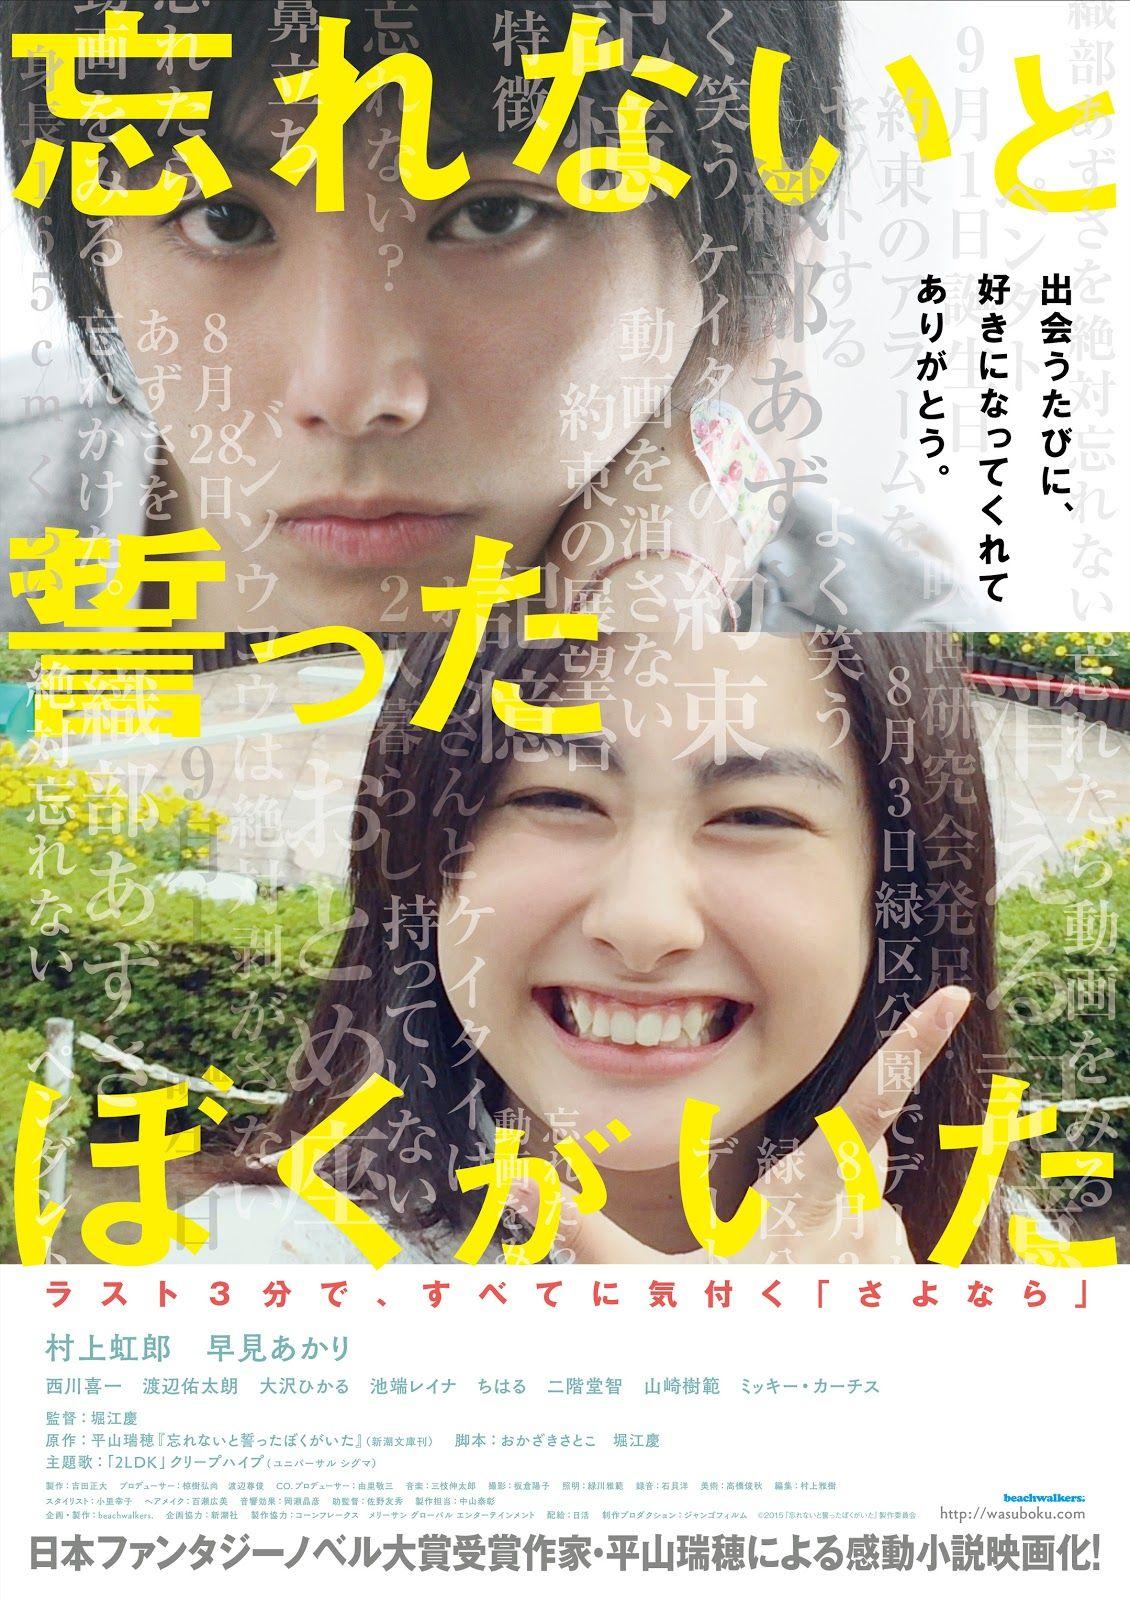 Me Not (2015) Subtitle Indonesia Japanese movie